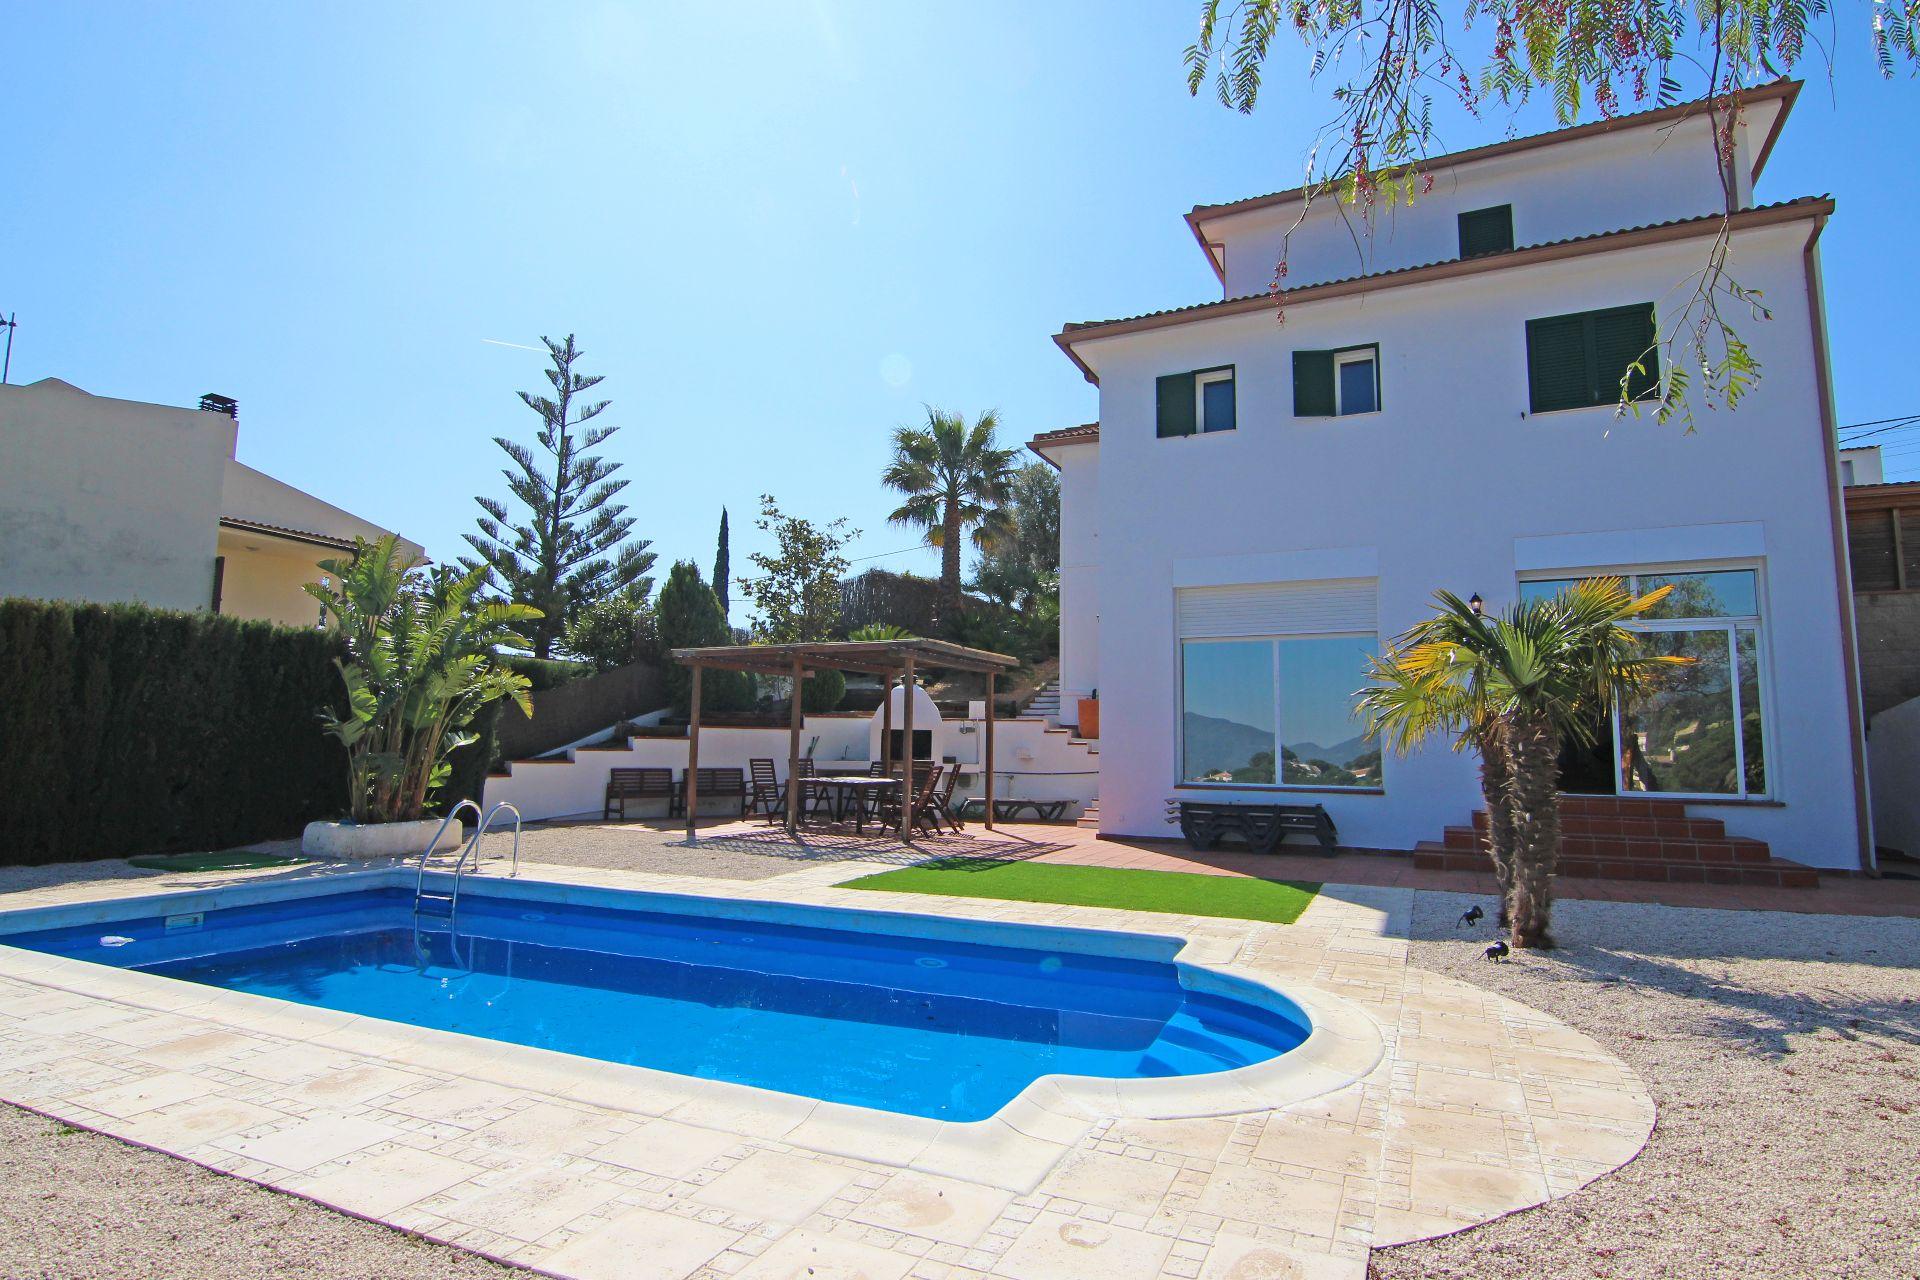 Casa en Sant Cebrià de Vallalta. Fantastica villa de lujo en sant cebrià con piscina con maravill